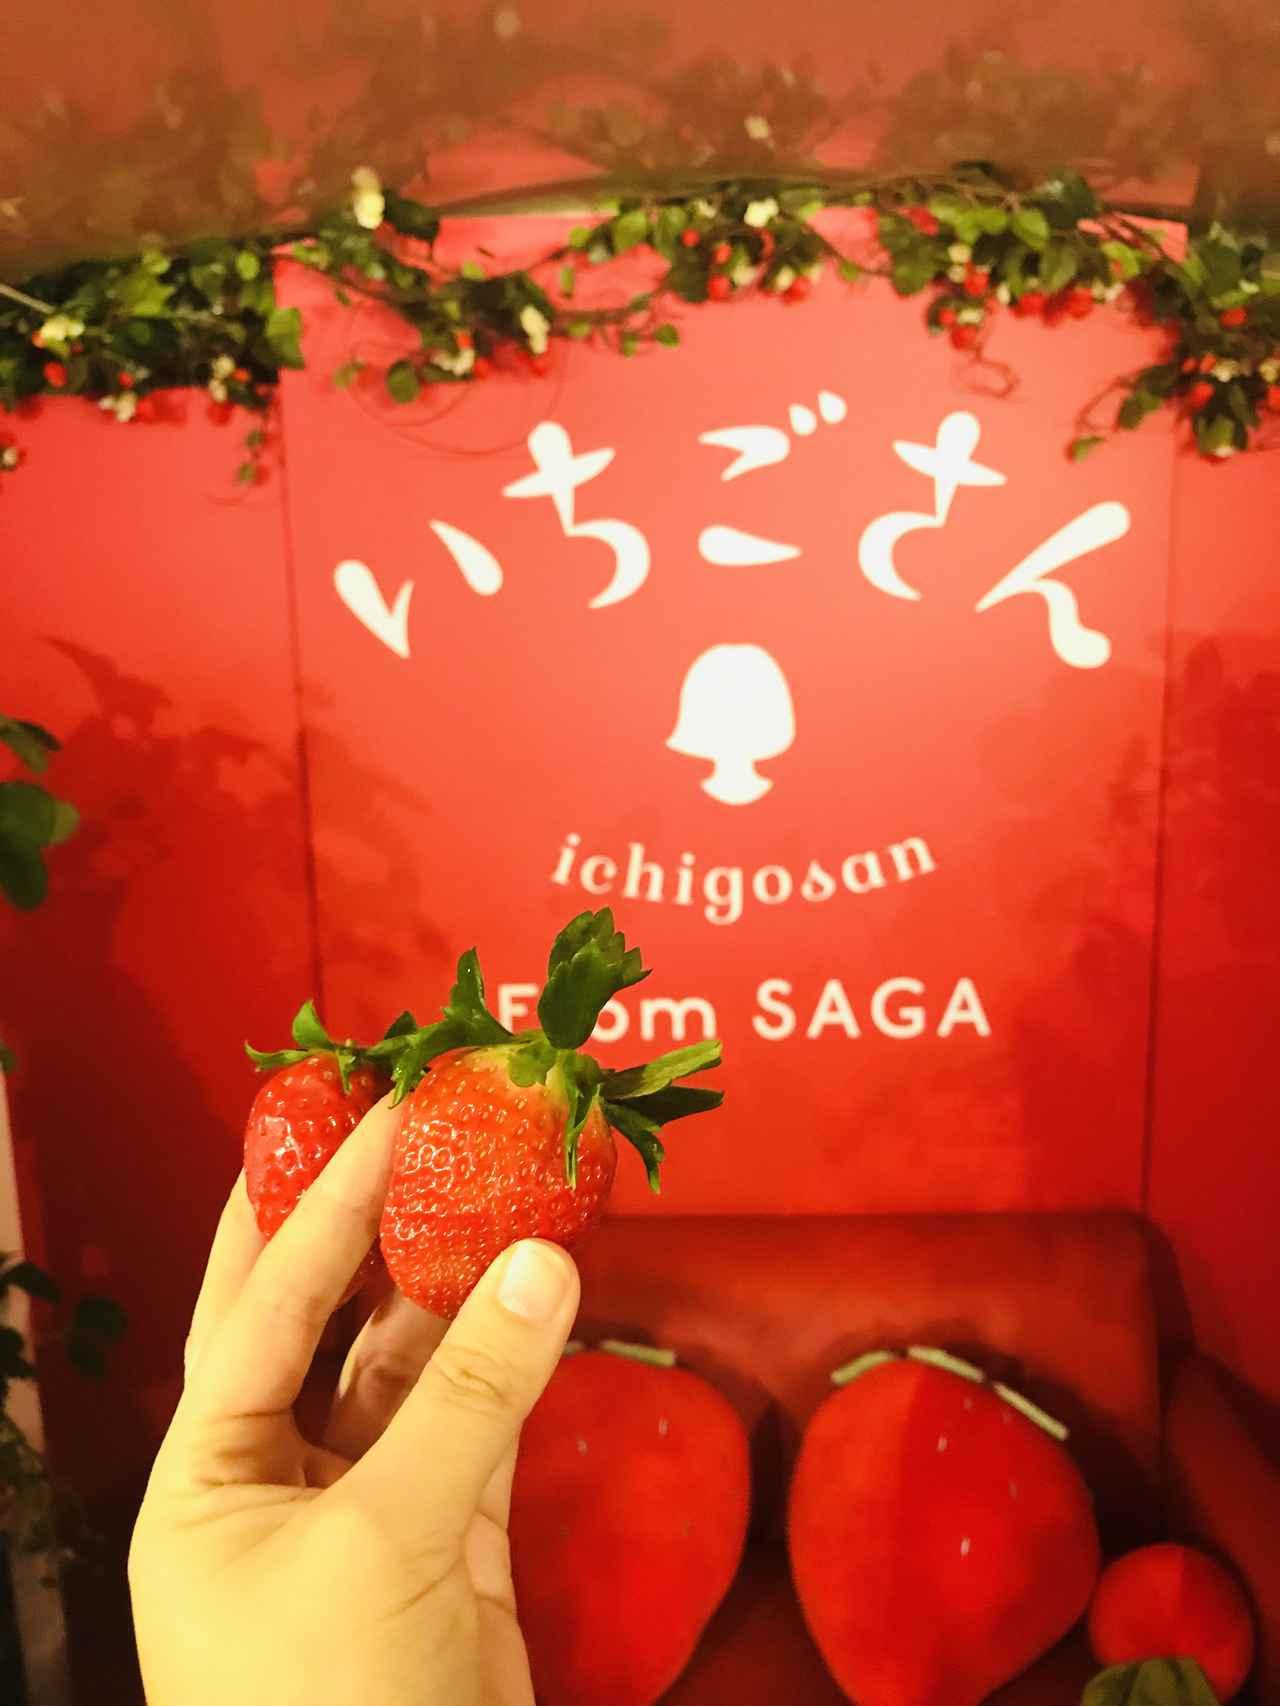 Images : 1番目の画像 - 「【試食レポ】佐賀県の新しいブランドいちご「いちごさん」を食べながら都内を巡る「いちごさんバス」運行!」のアルバム - カワコレメディア | 最新トレンド・コスメ・スイーツなど女の子のためのガールズメディアです!